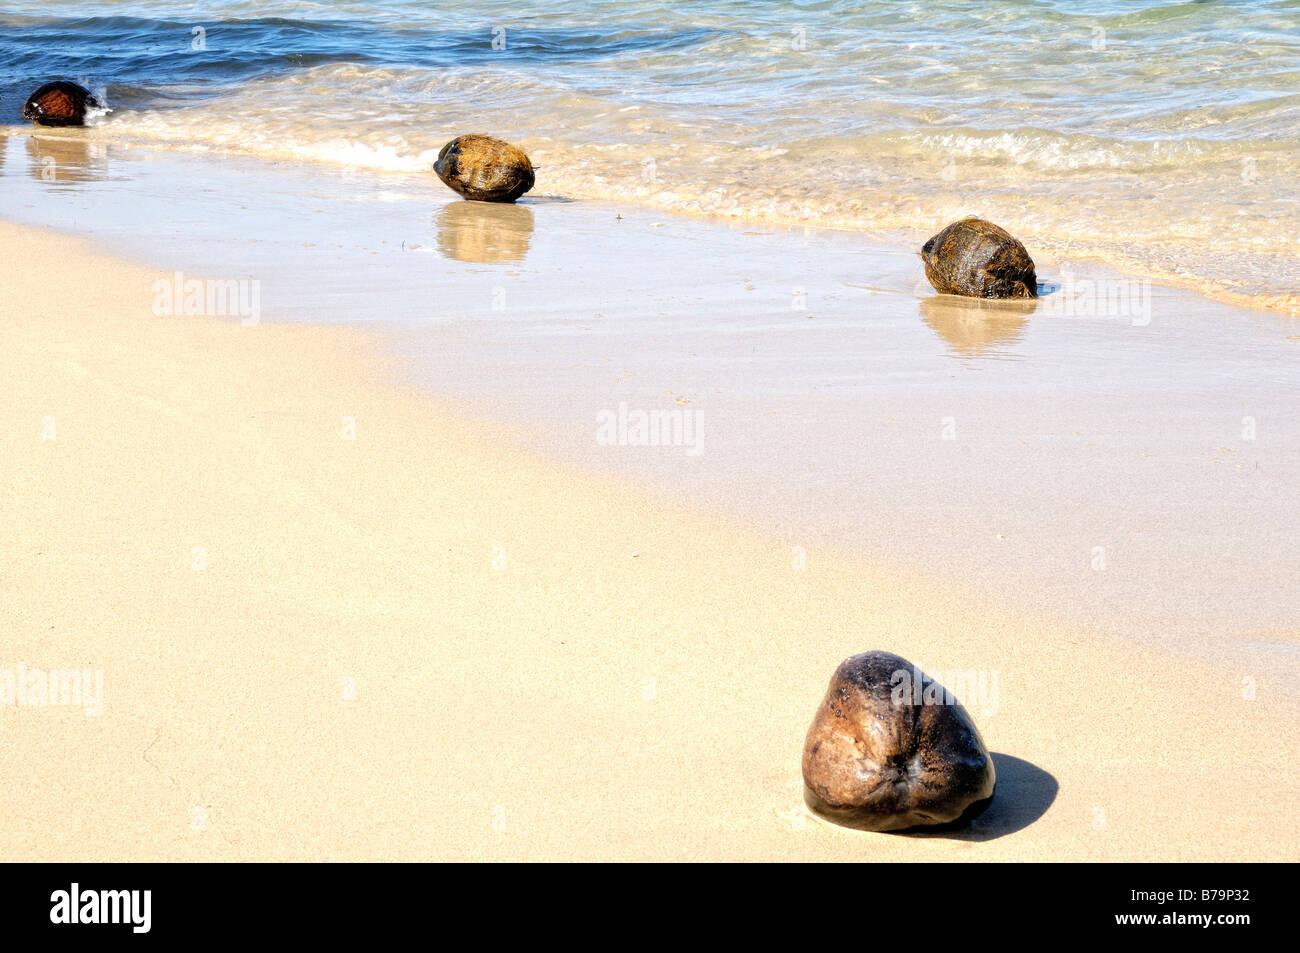 Coconuts fallen on the beach of Papetoai, Moorea, French Polynesia - Stock Image